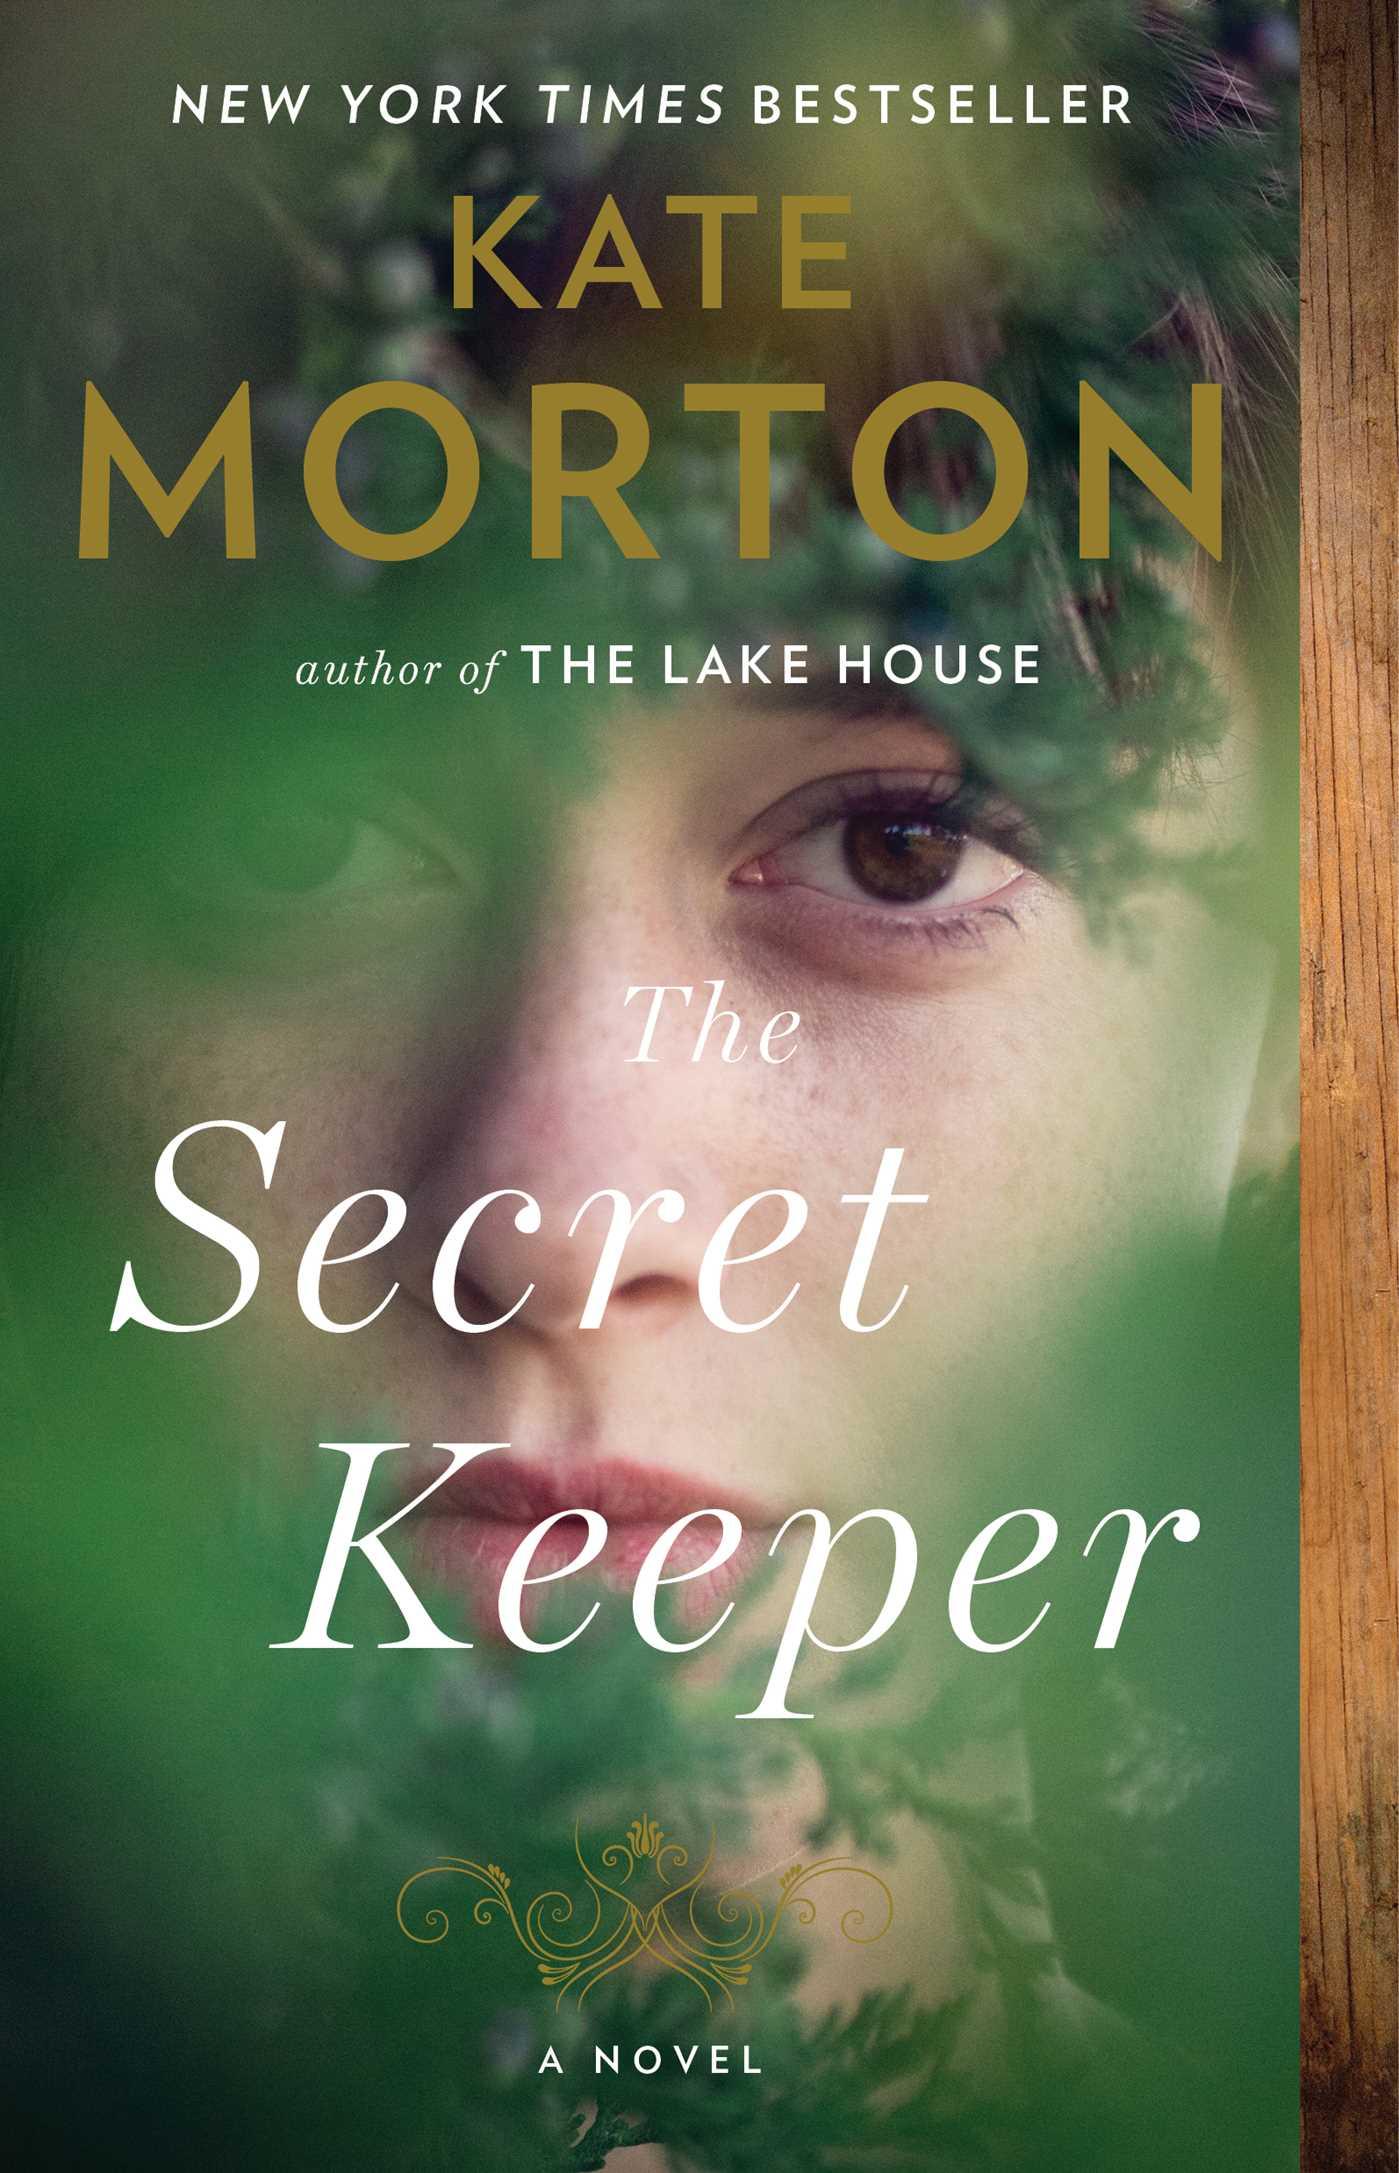 The secret keeper 9781439152812 hr